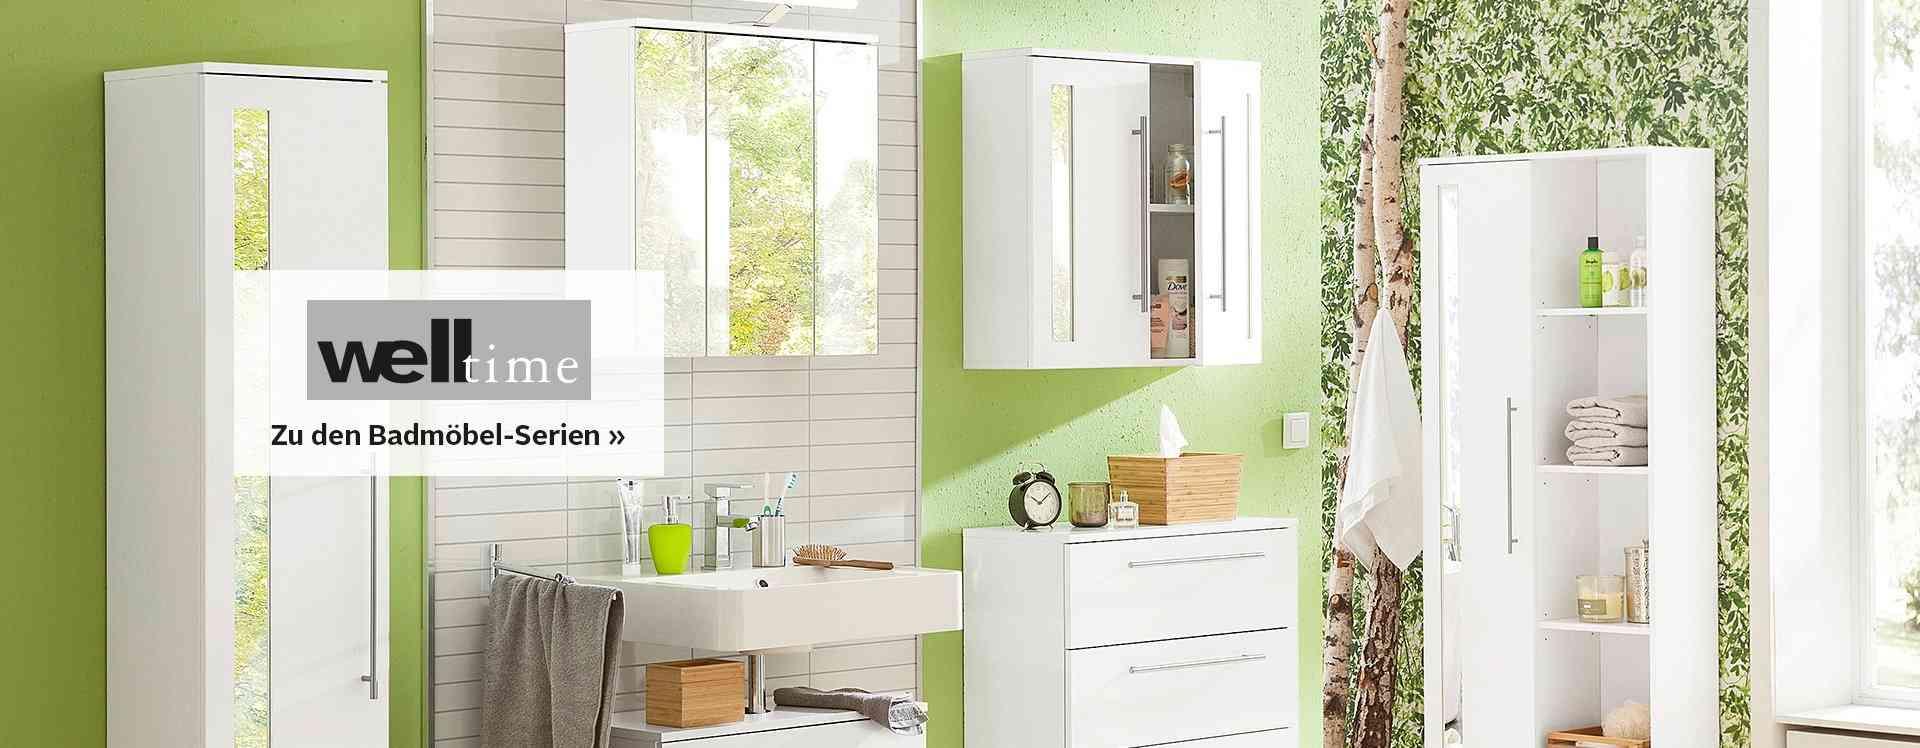 welltime m bel online kaufen otto. Black Bedroom Furniture Sets. Home Design Ideas